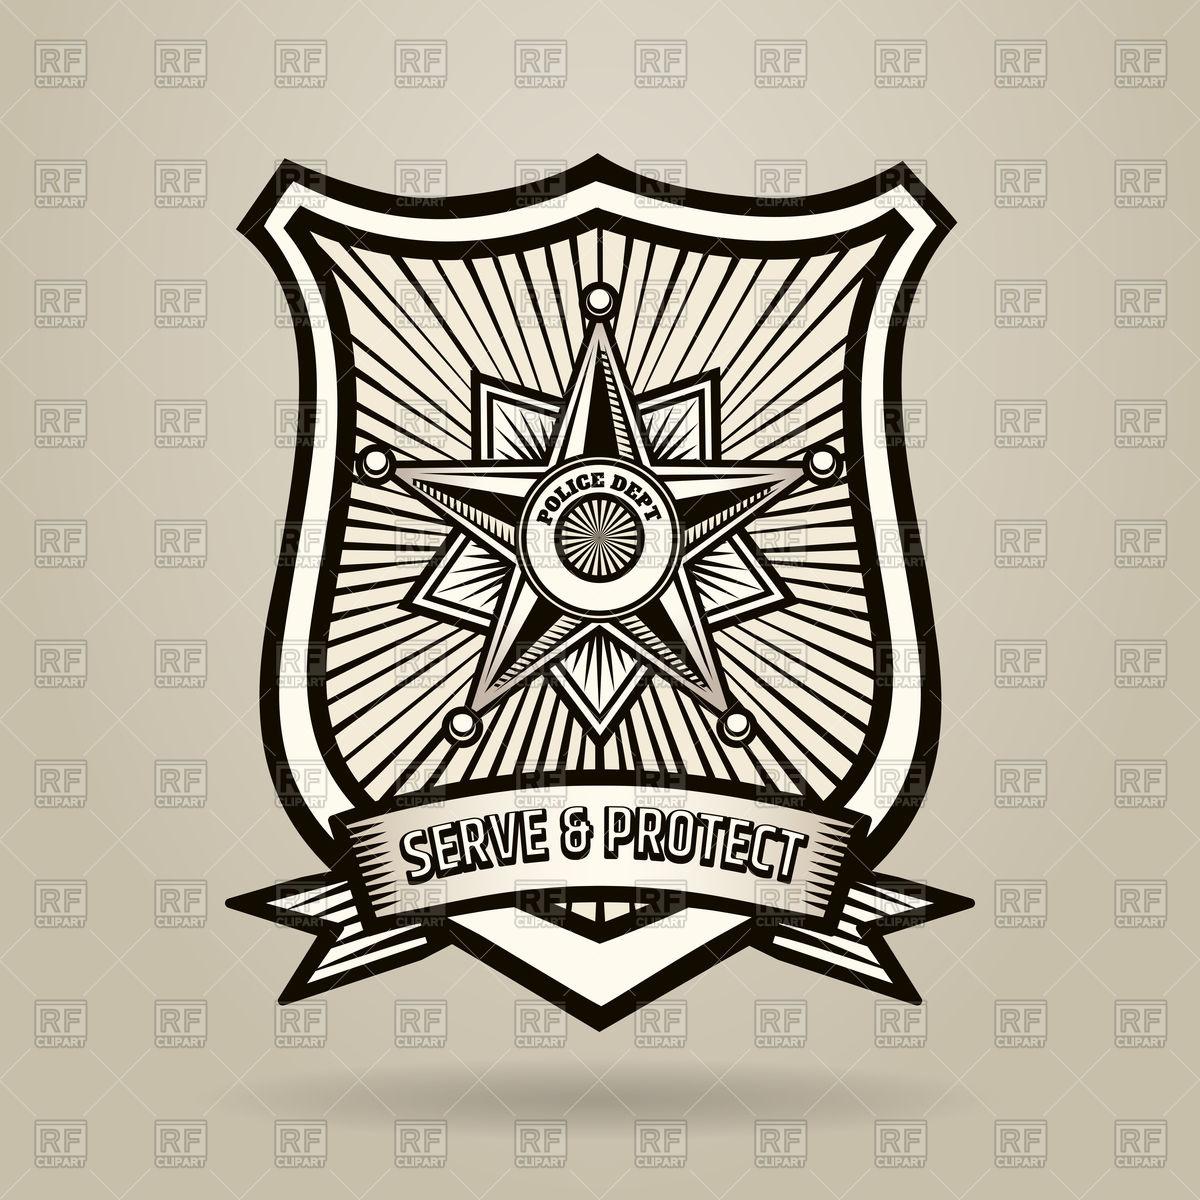 1200x1200 Police Badge Vector Image Vector Artwork Of Signs, Symbols, Maps